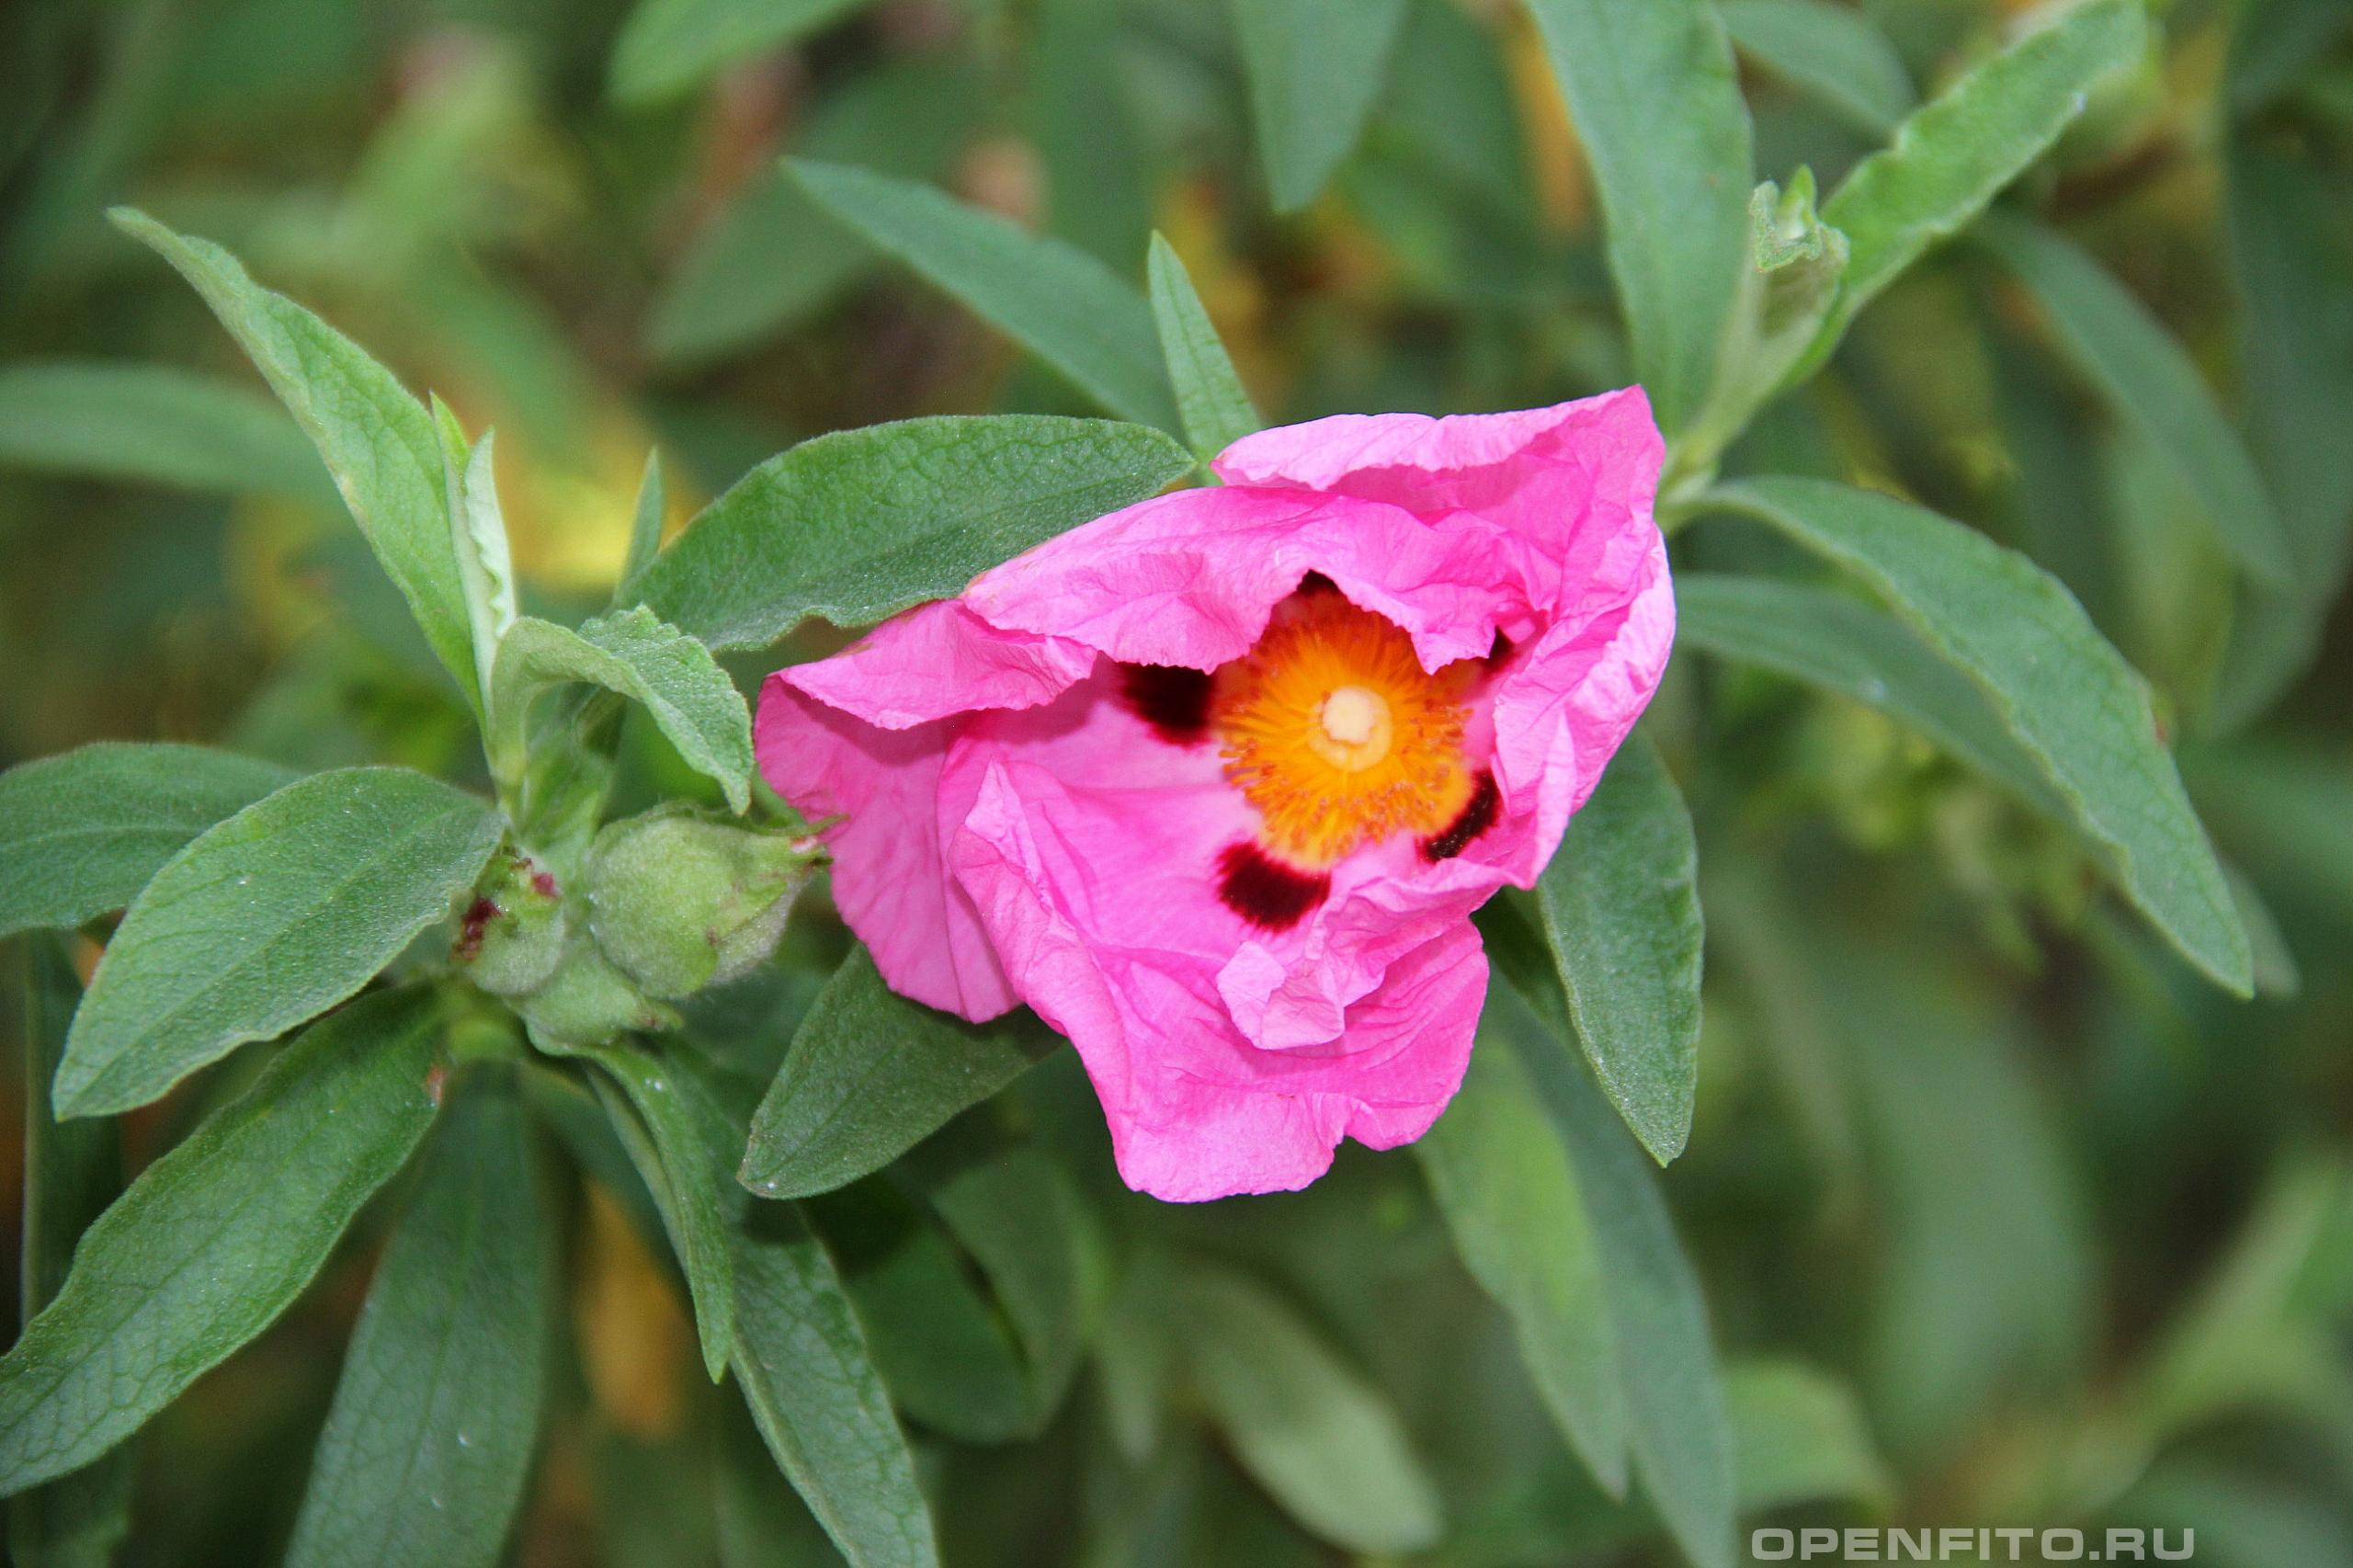 Ладанник крымский распускающийся цветок